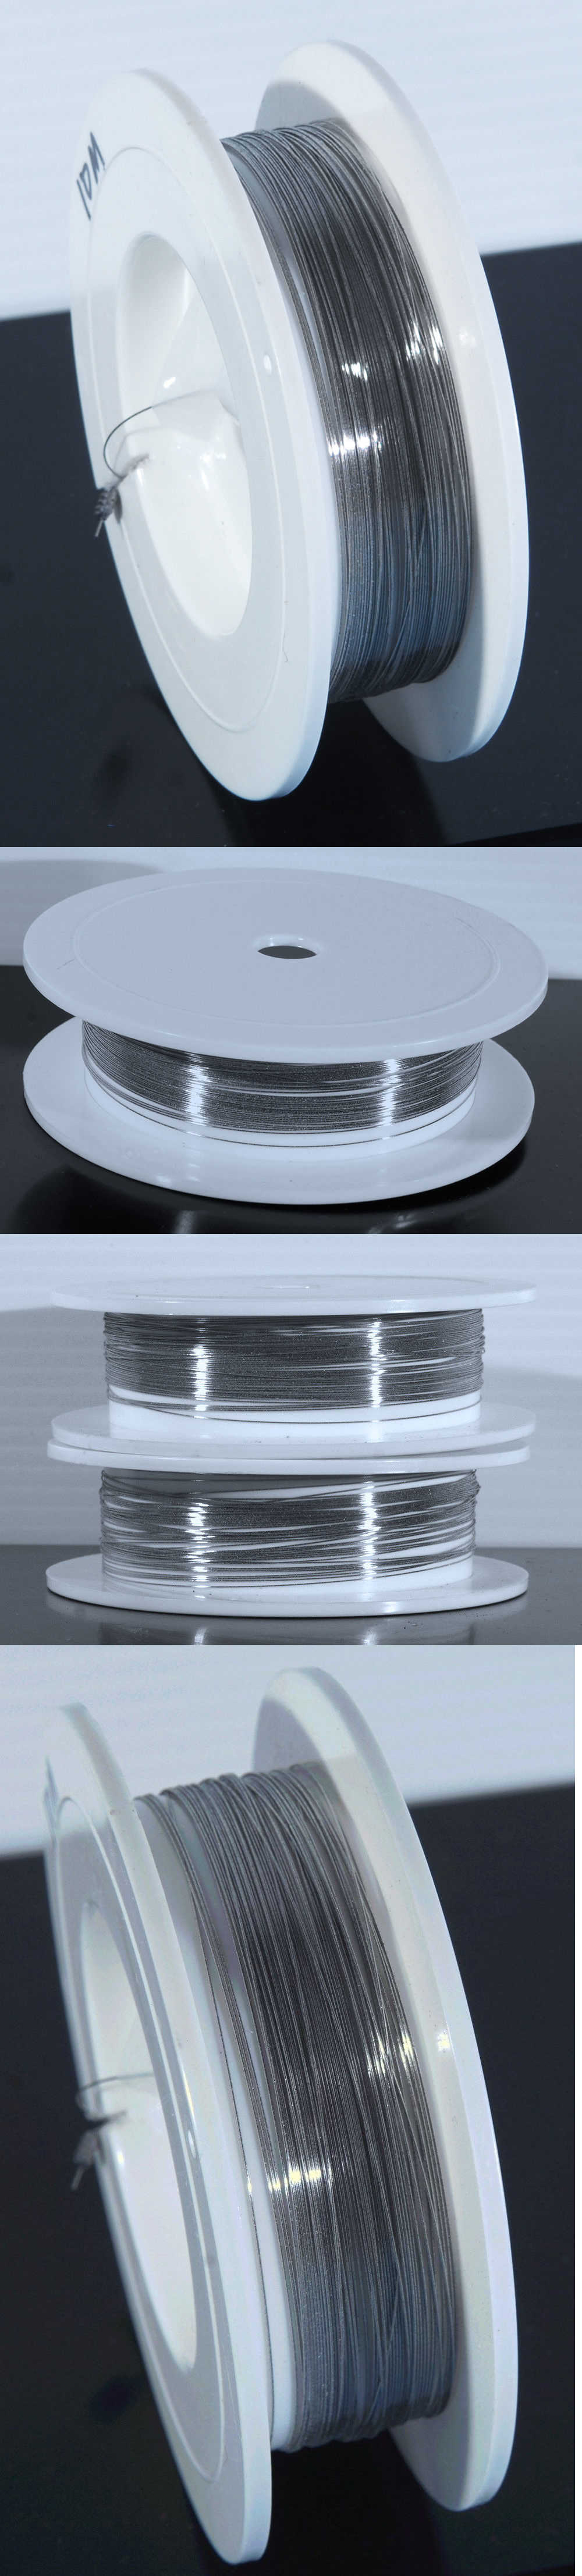 Glass Art Tools 3101: Diamond Wire Saw Wire 0.36Mm Cut Diameter ...